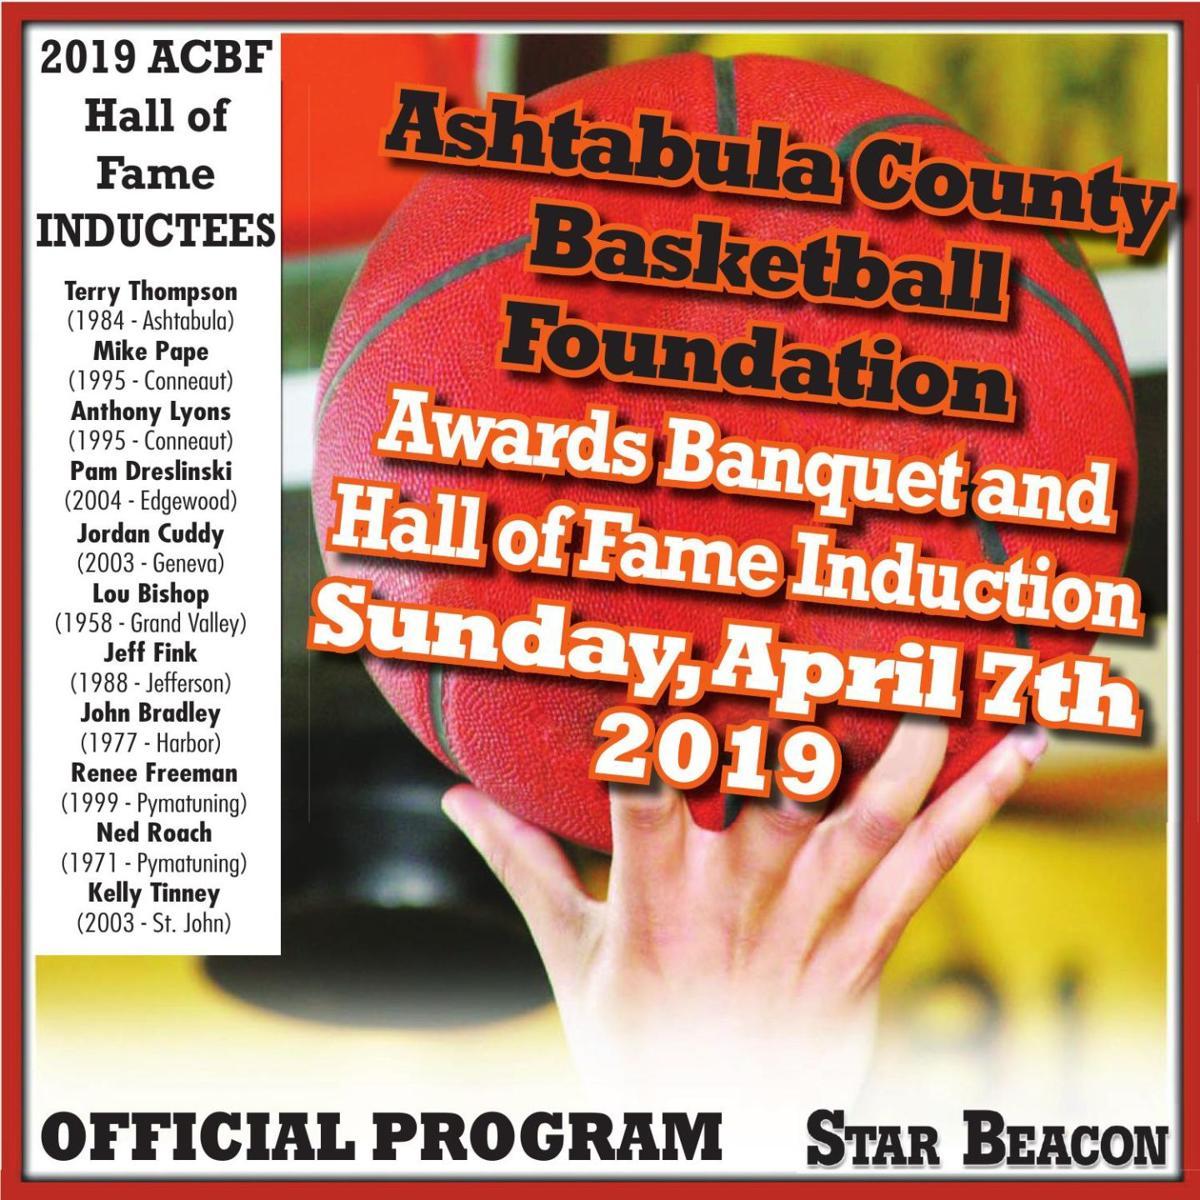 2019 Ashtabula County Basketball Foundation